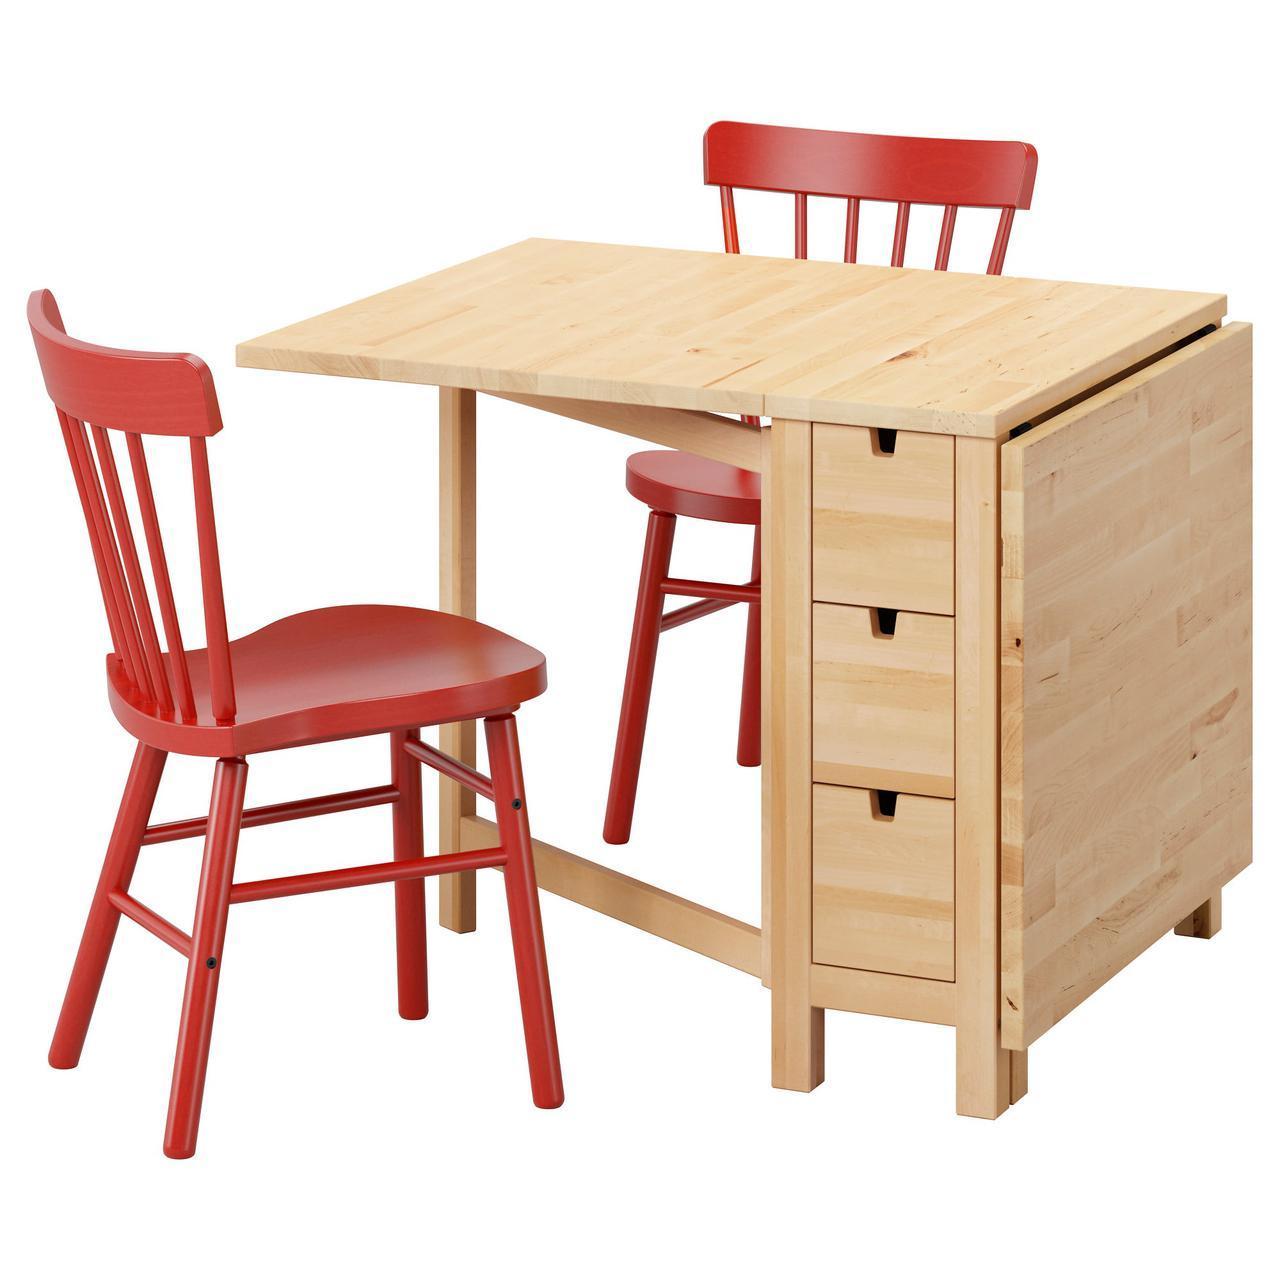 IKEA NORDEN / NORRARYD (291.614.98) Стол и 2 стула, красная